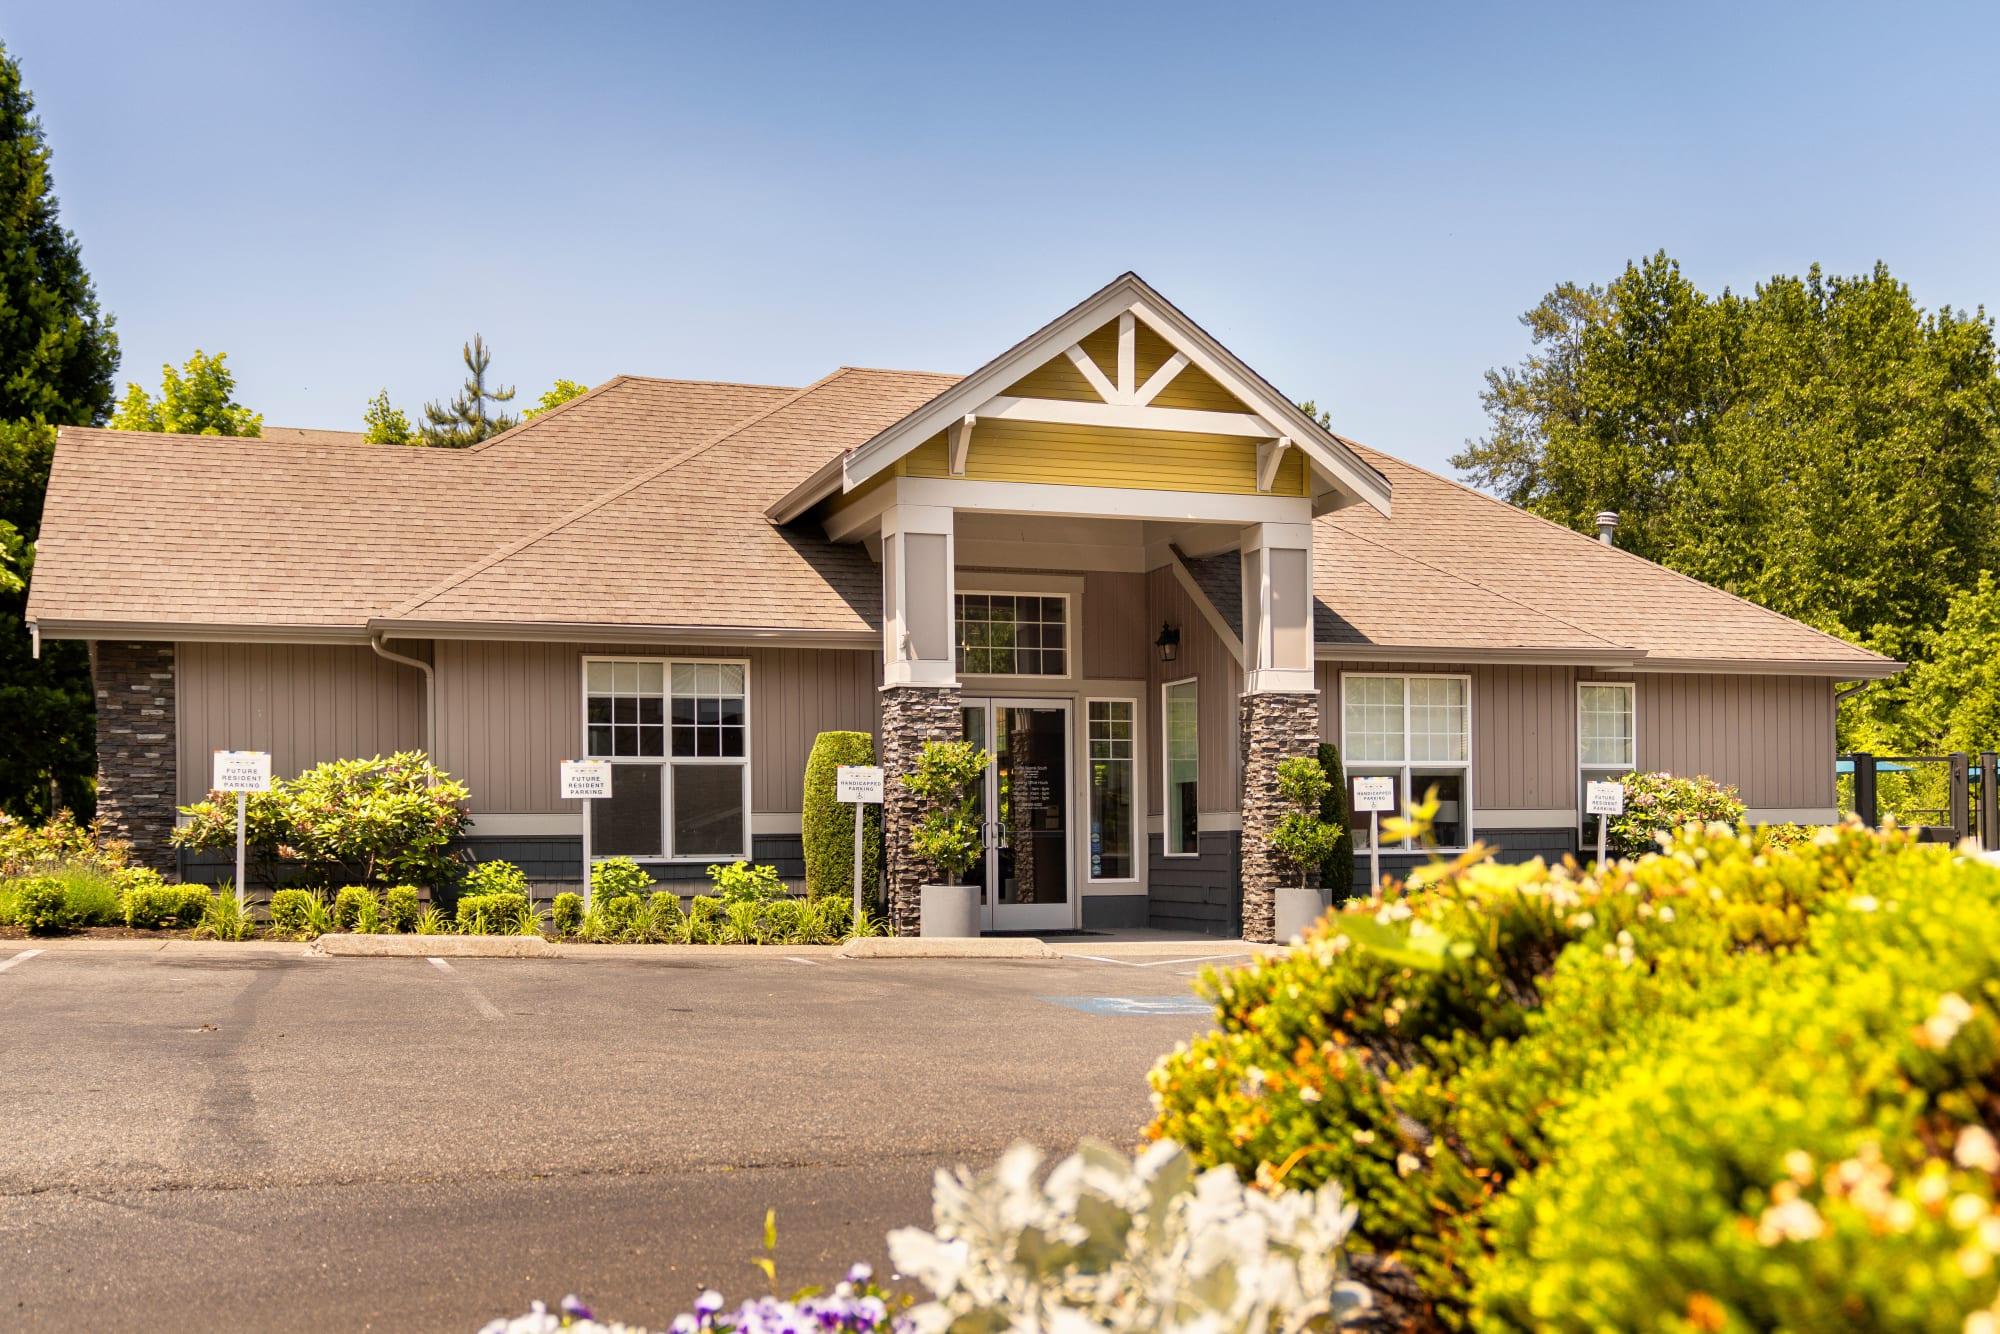 Leasing office entrance at Brookside Village in Auburn, Washington